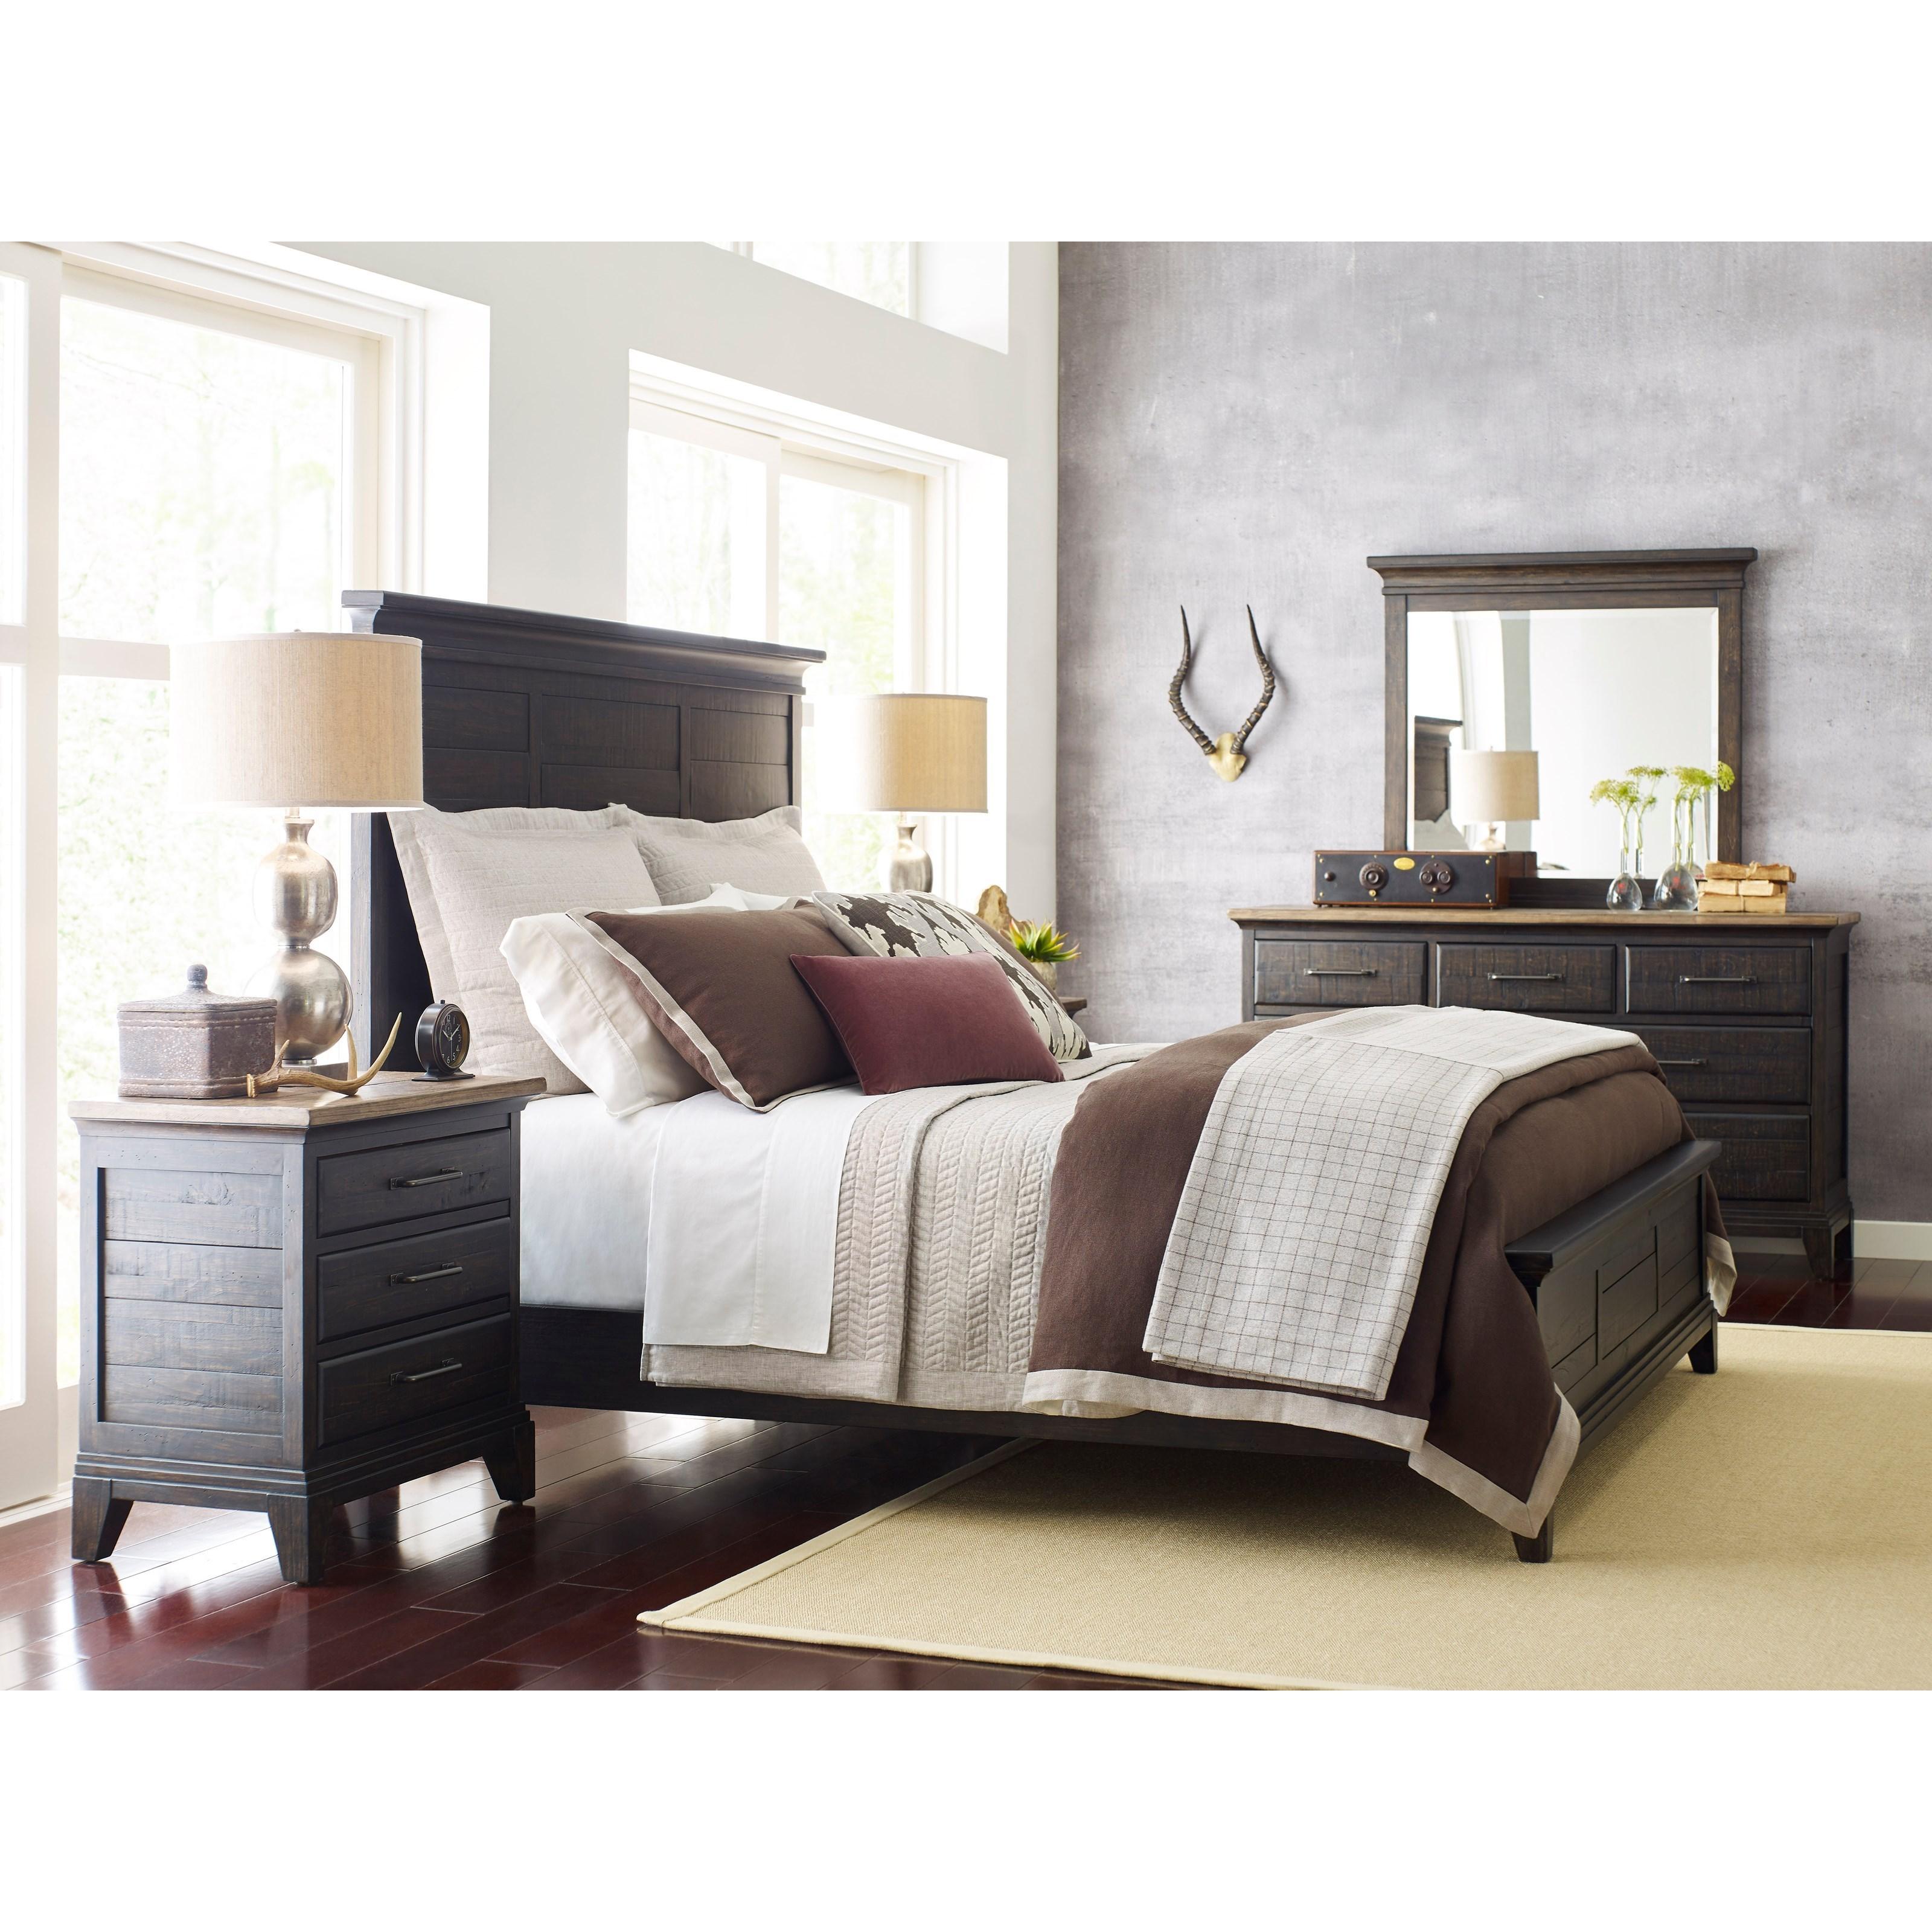 Kincaid Furniture Plank Road Jessup Solid Wood California King Panel Bed Jacksonville